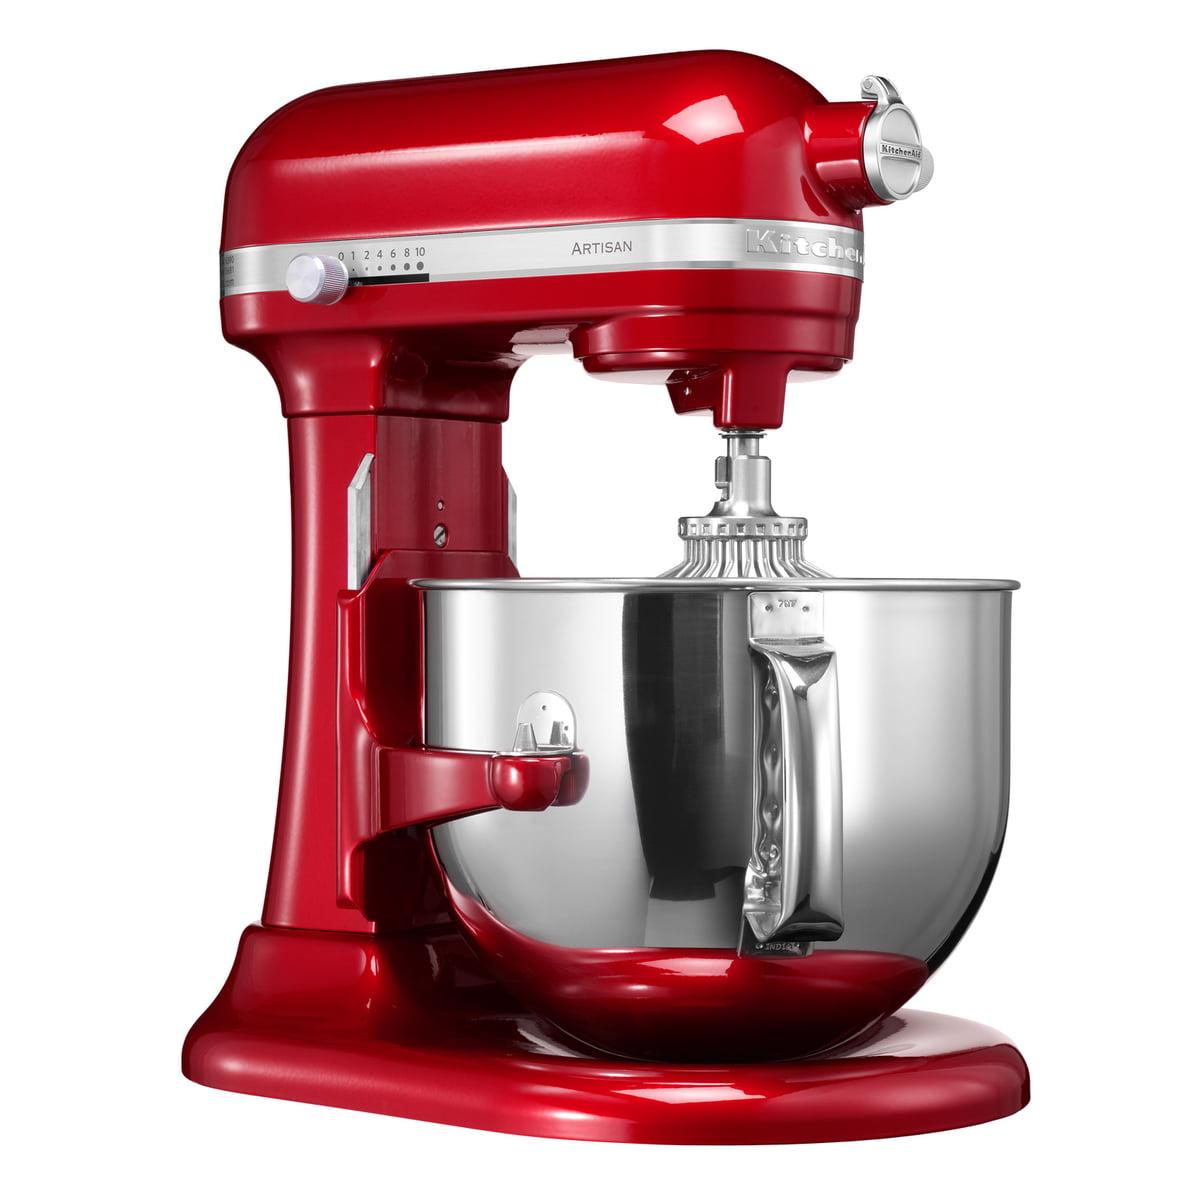 Artisan køkkenmaskine 6,9 l fra KitchenAid